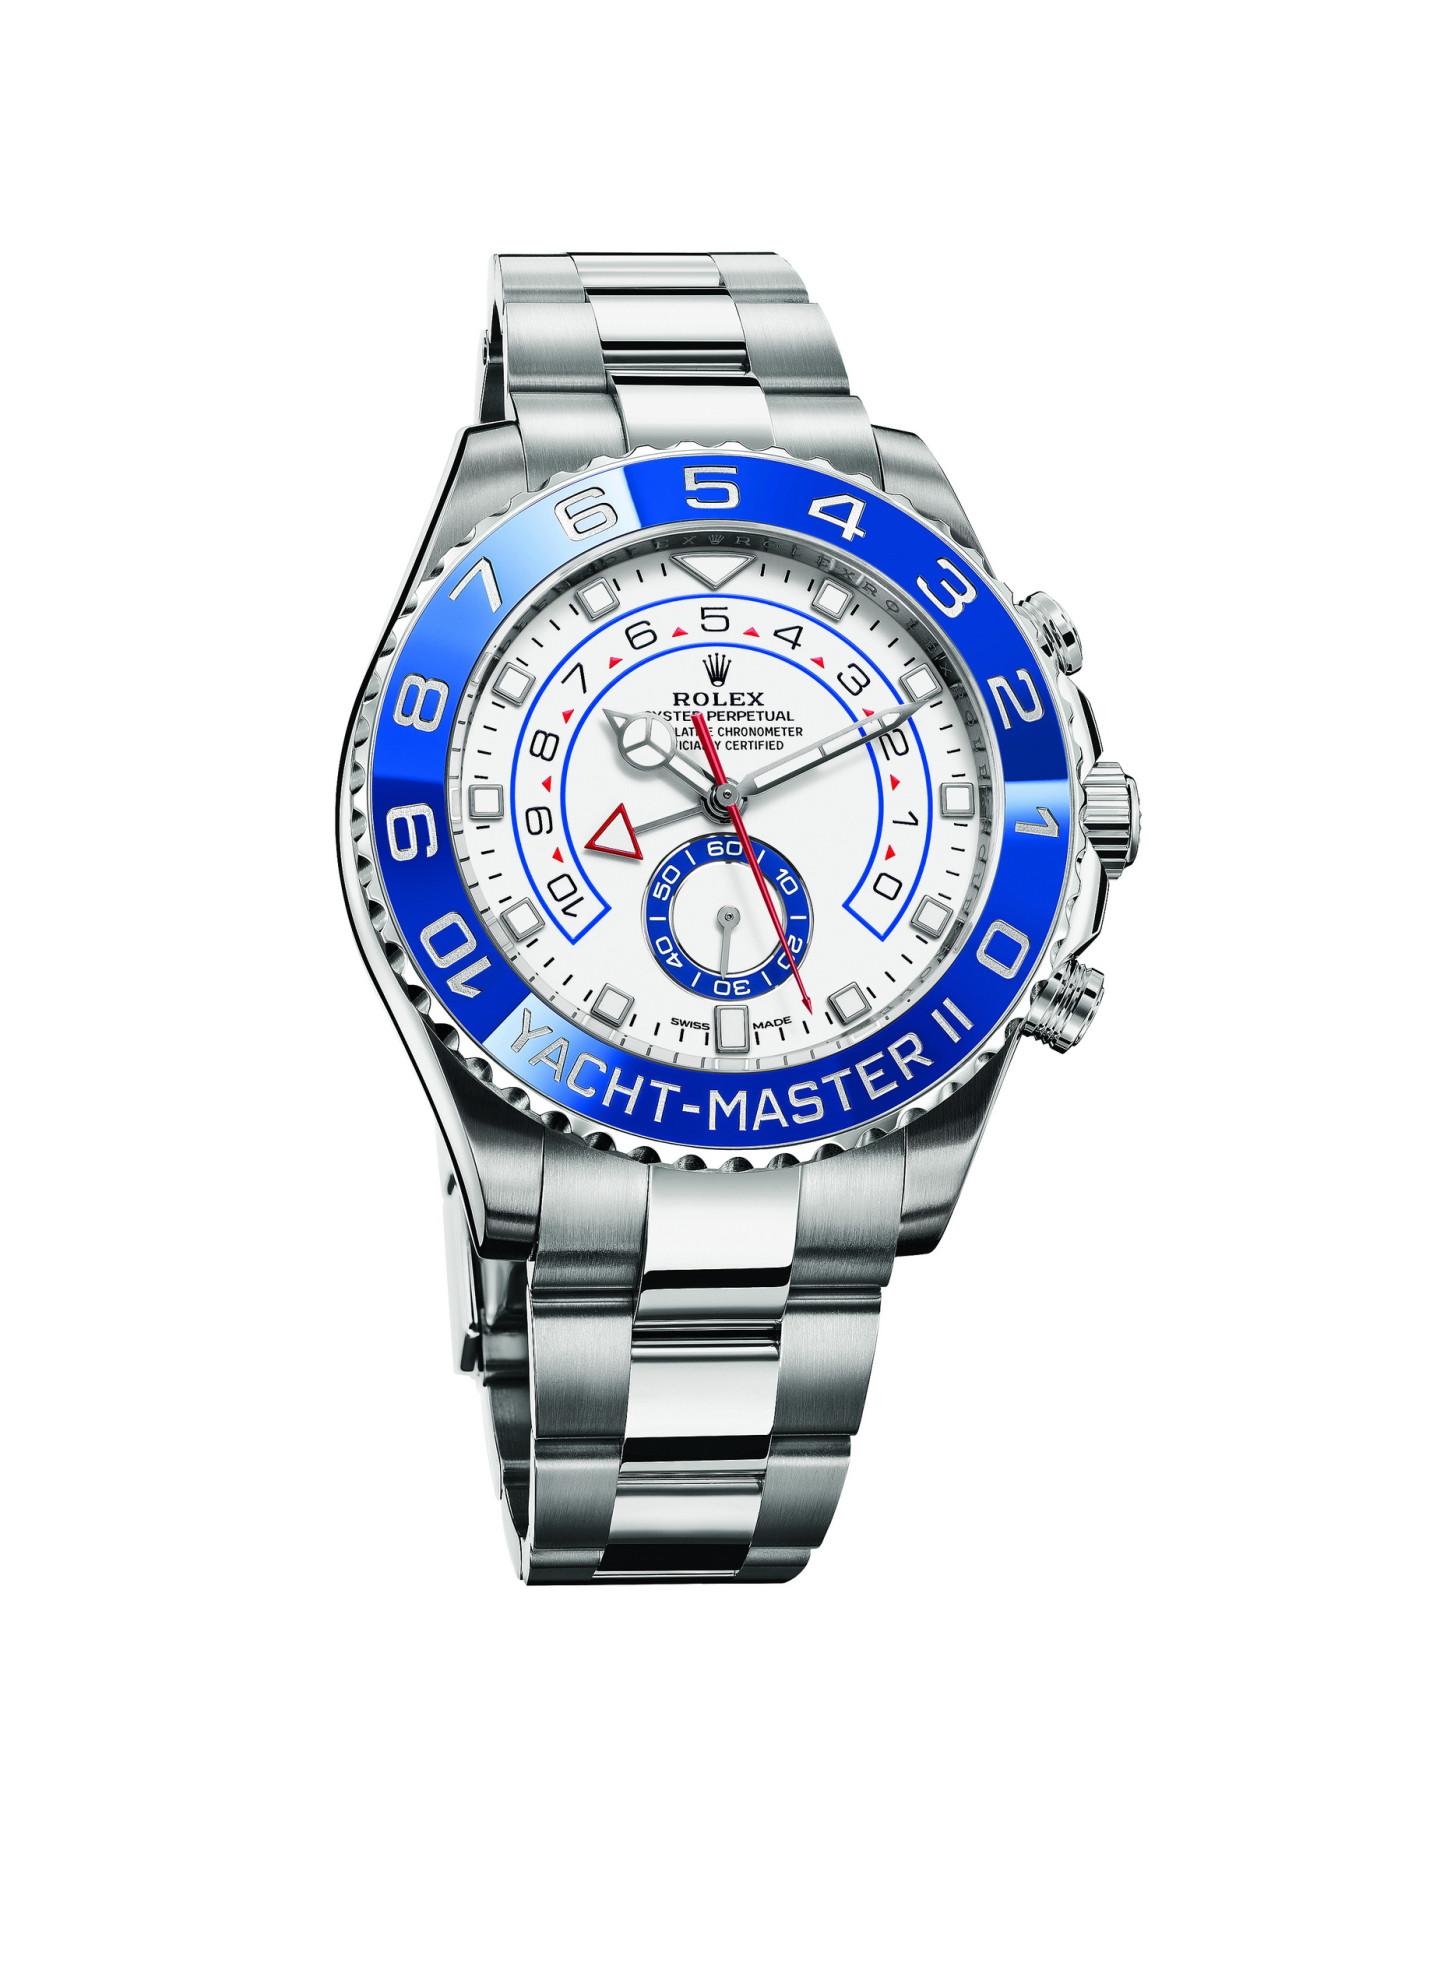 Трофей регаты Rolex Sydney Hobart — часы Oyster Perpetual Yacht-Master II